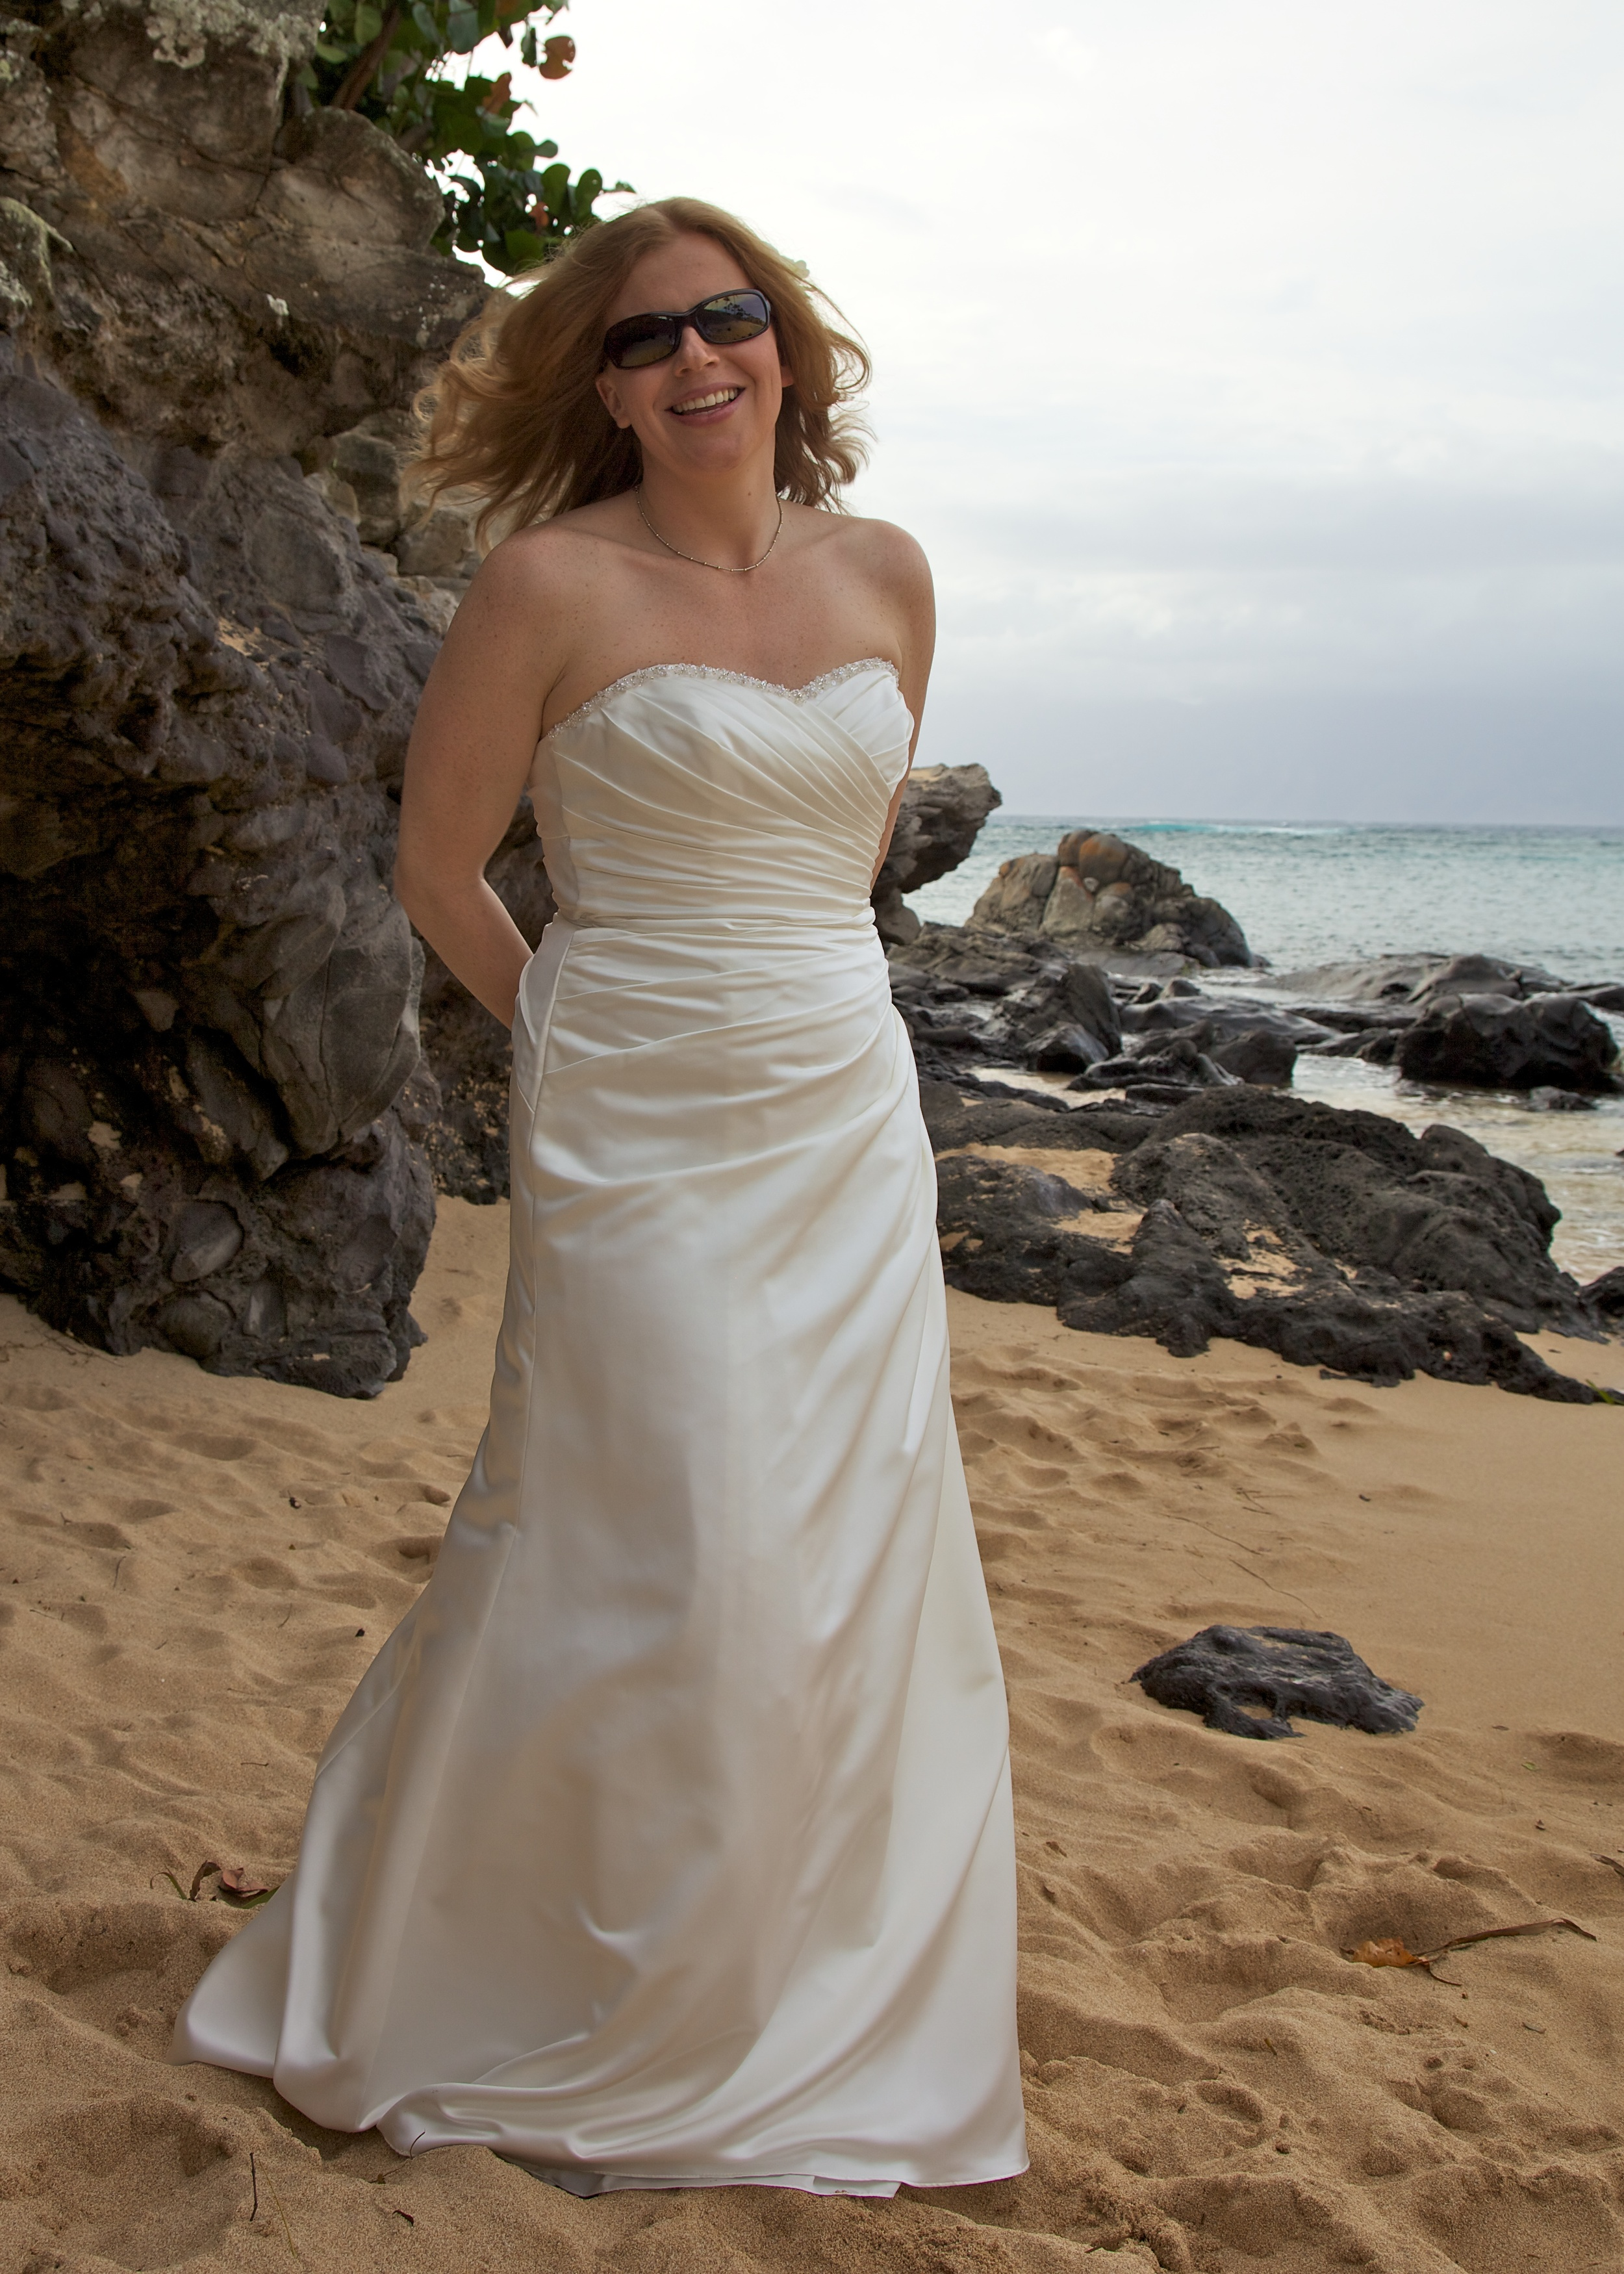 Wedding++28023+%2817+of+50%29-1766401812-O.jpg